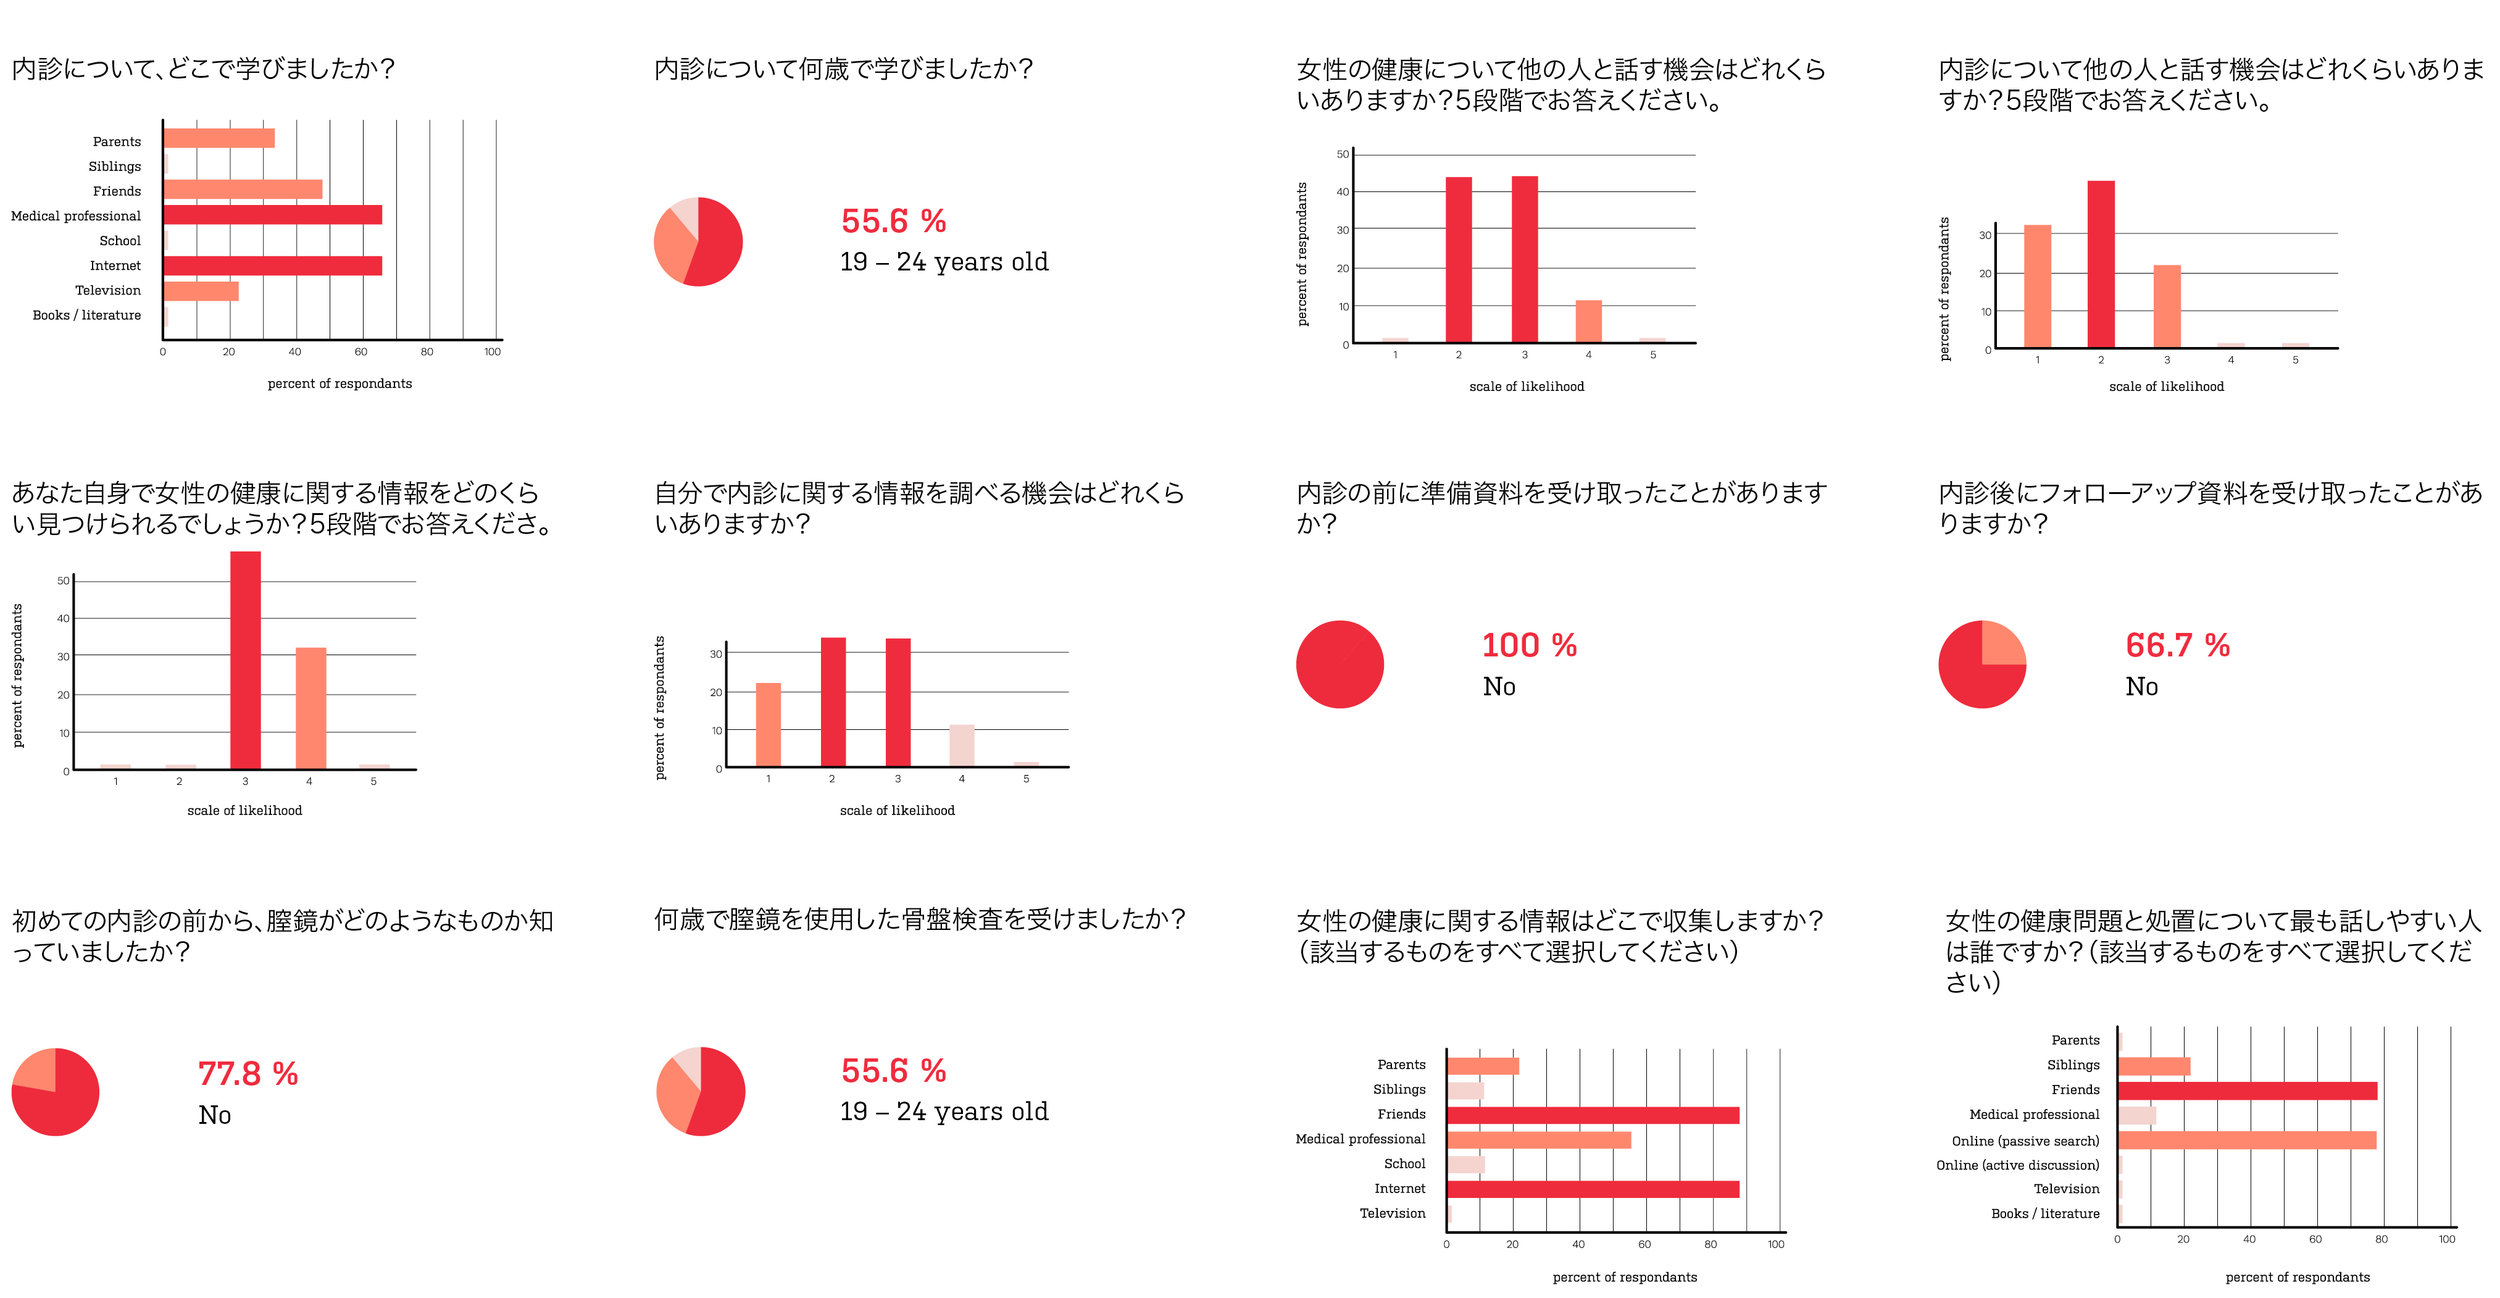 graph jap existing knowledge.jpg